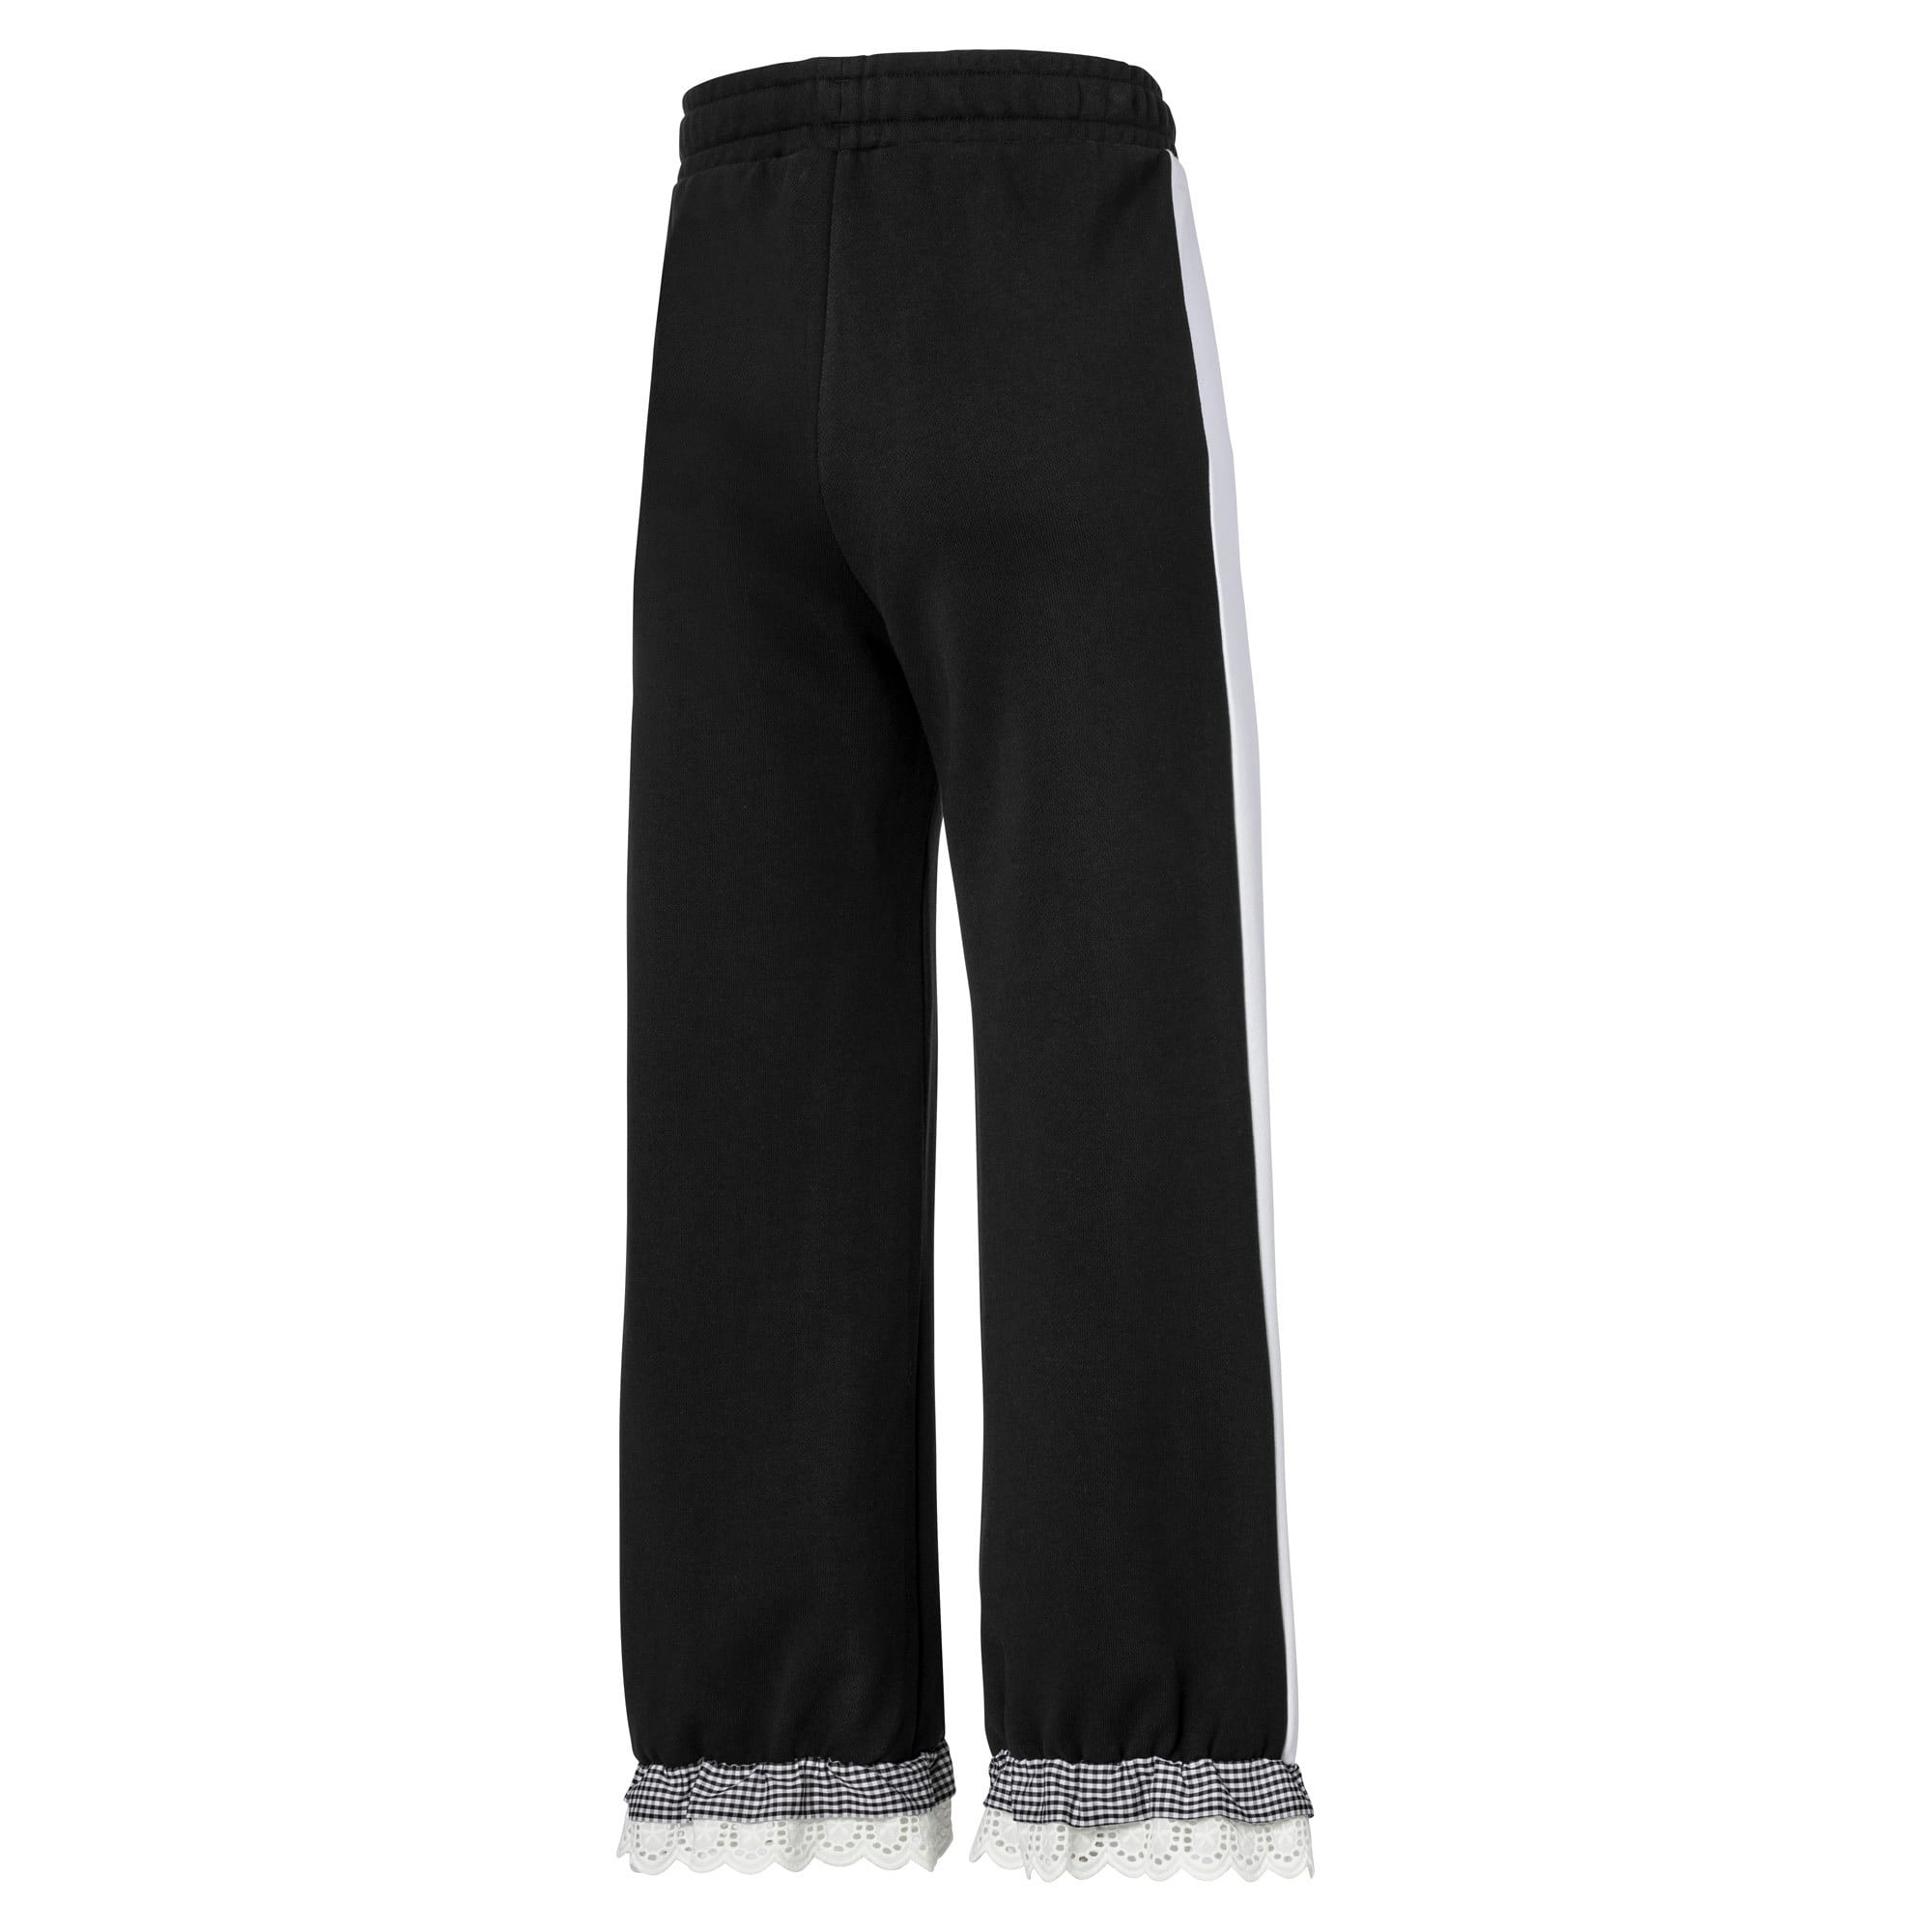 Thumbnail 5 of PUMA x TYAKASHA Knitted Women's Culottes, Cotton Black, medium